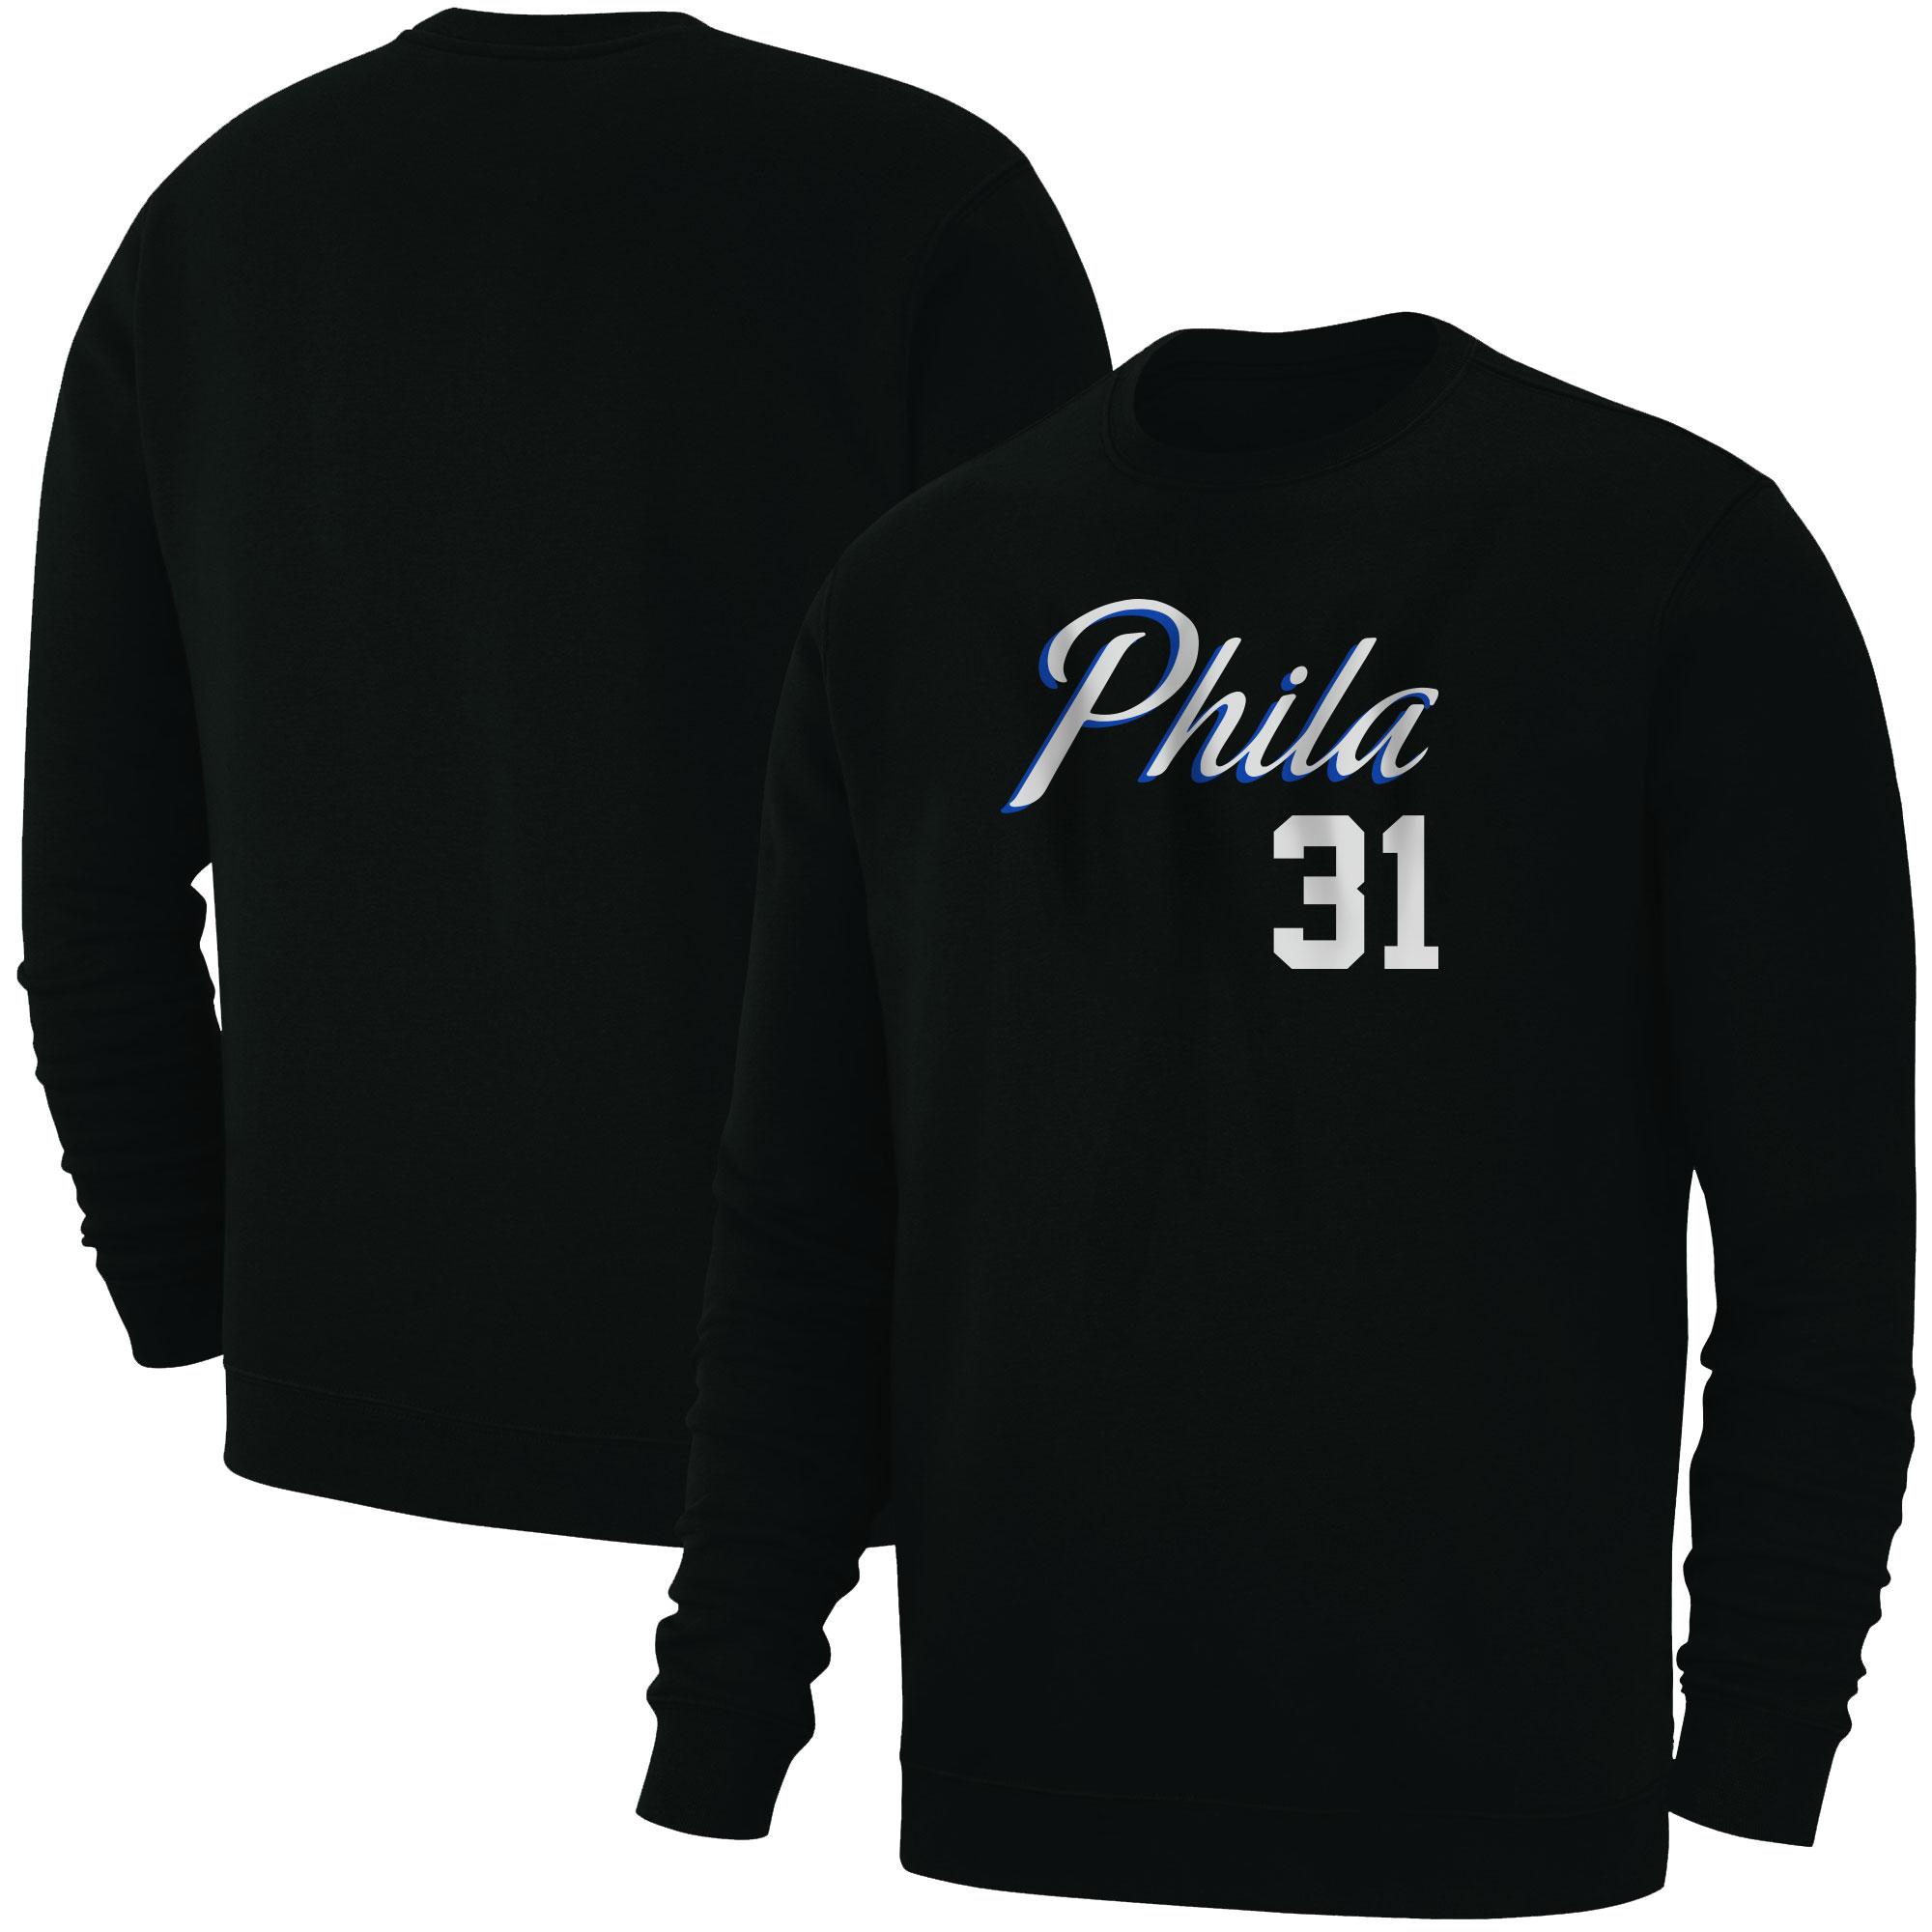 Philadelphia 76ers Seth Curry Basic (BSC-BLC-PLT-504-31)